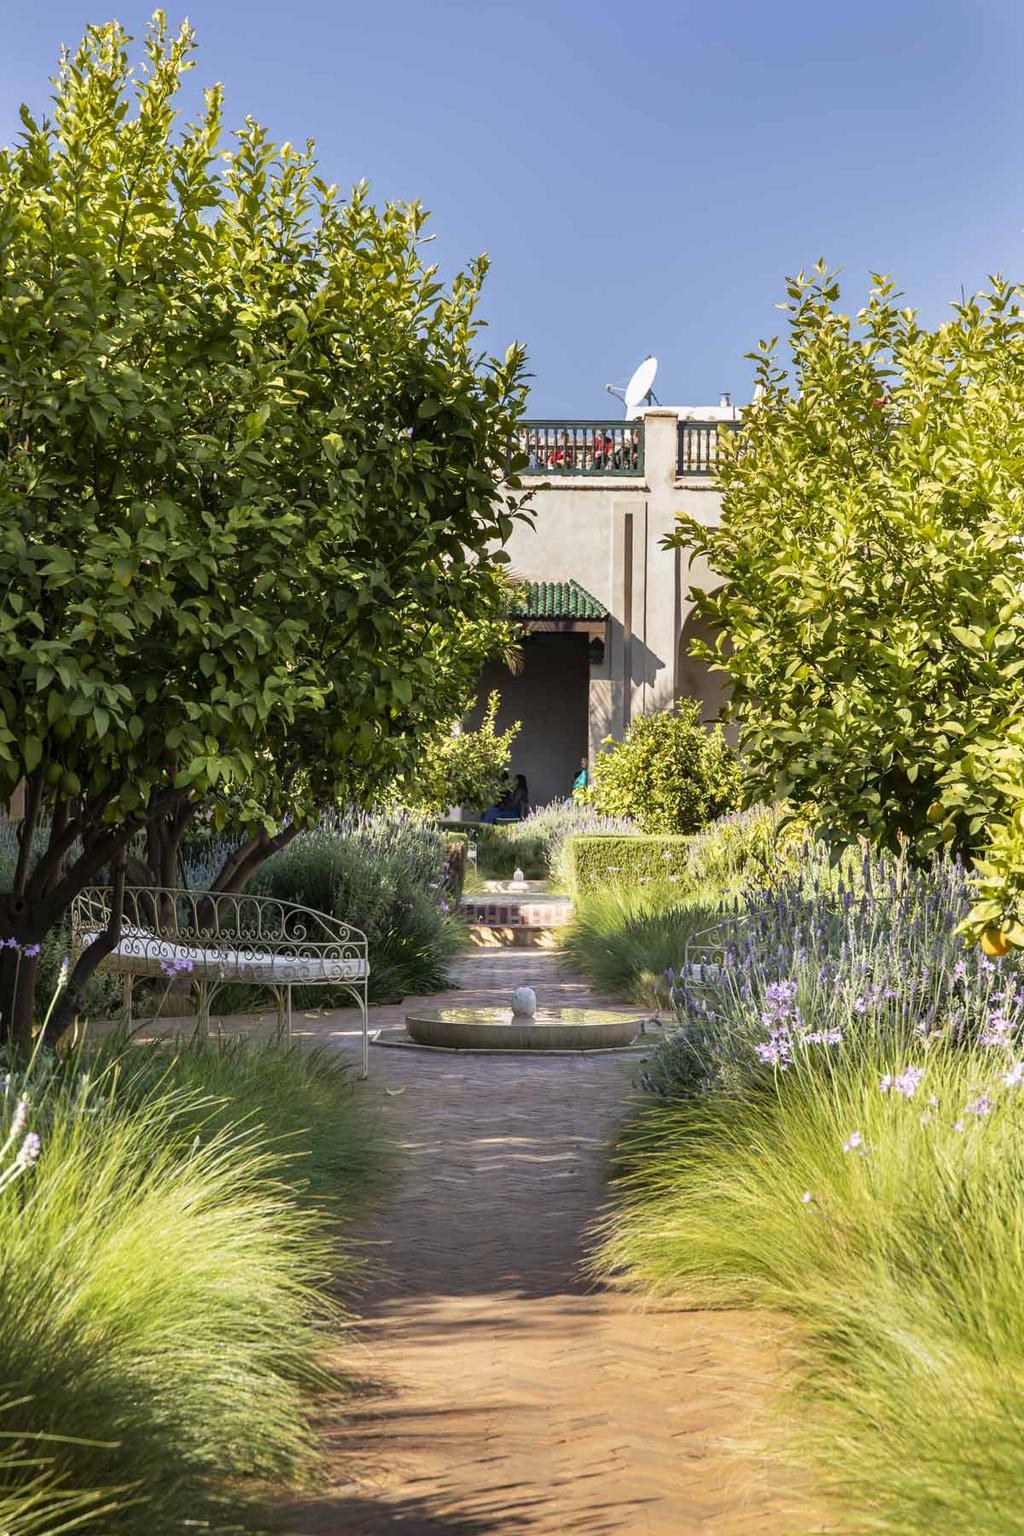 Marrakech vtwonen citytrip tuin